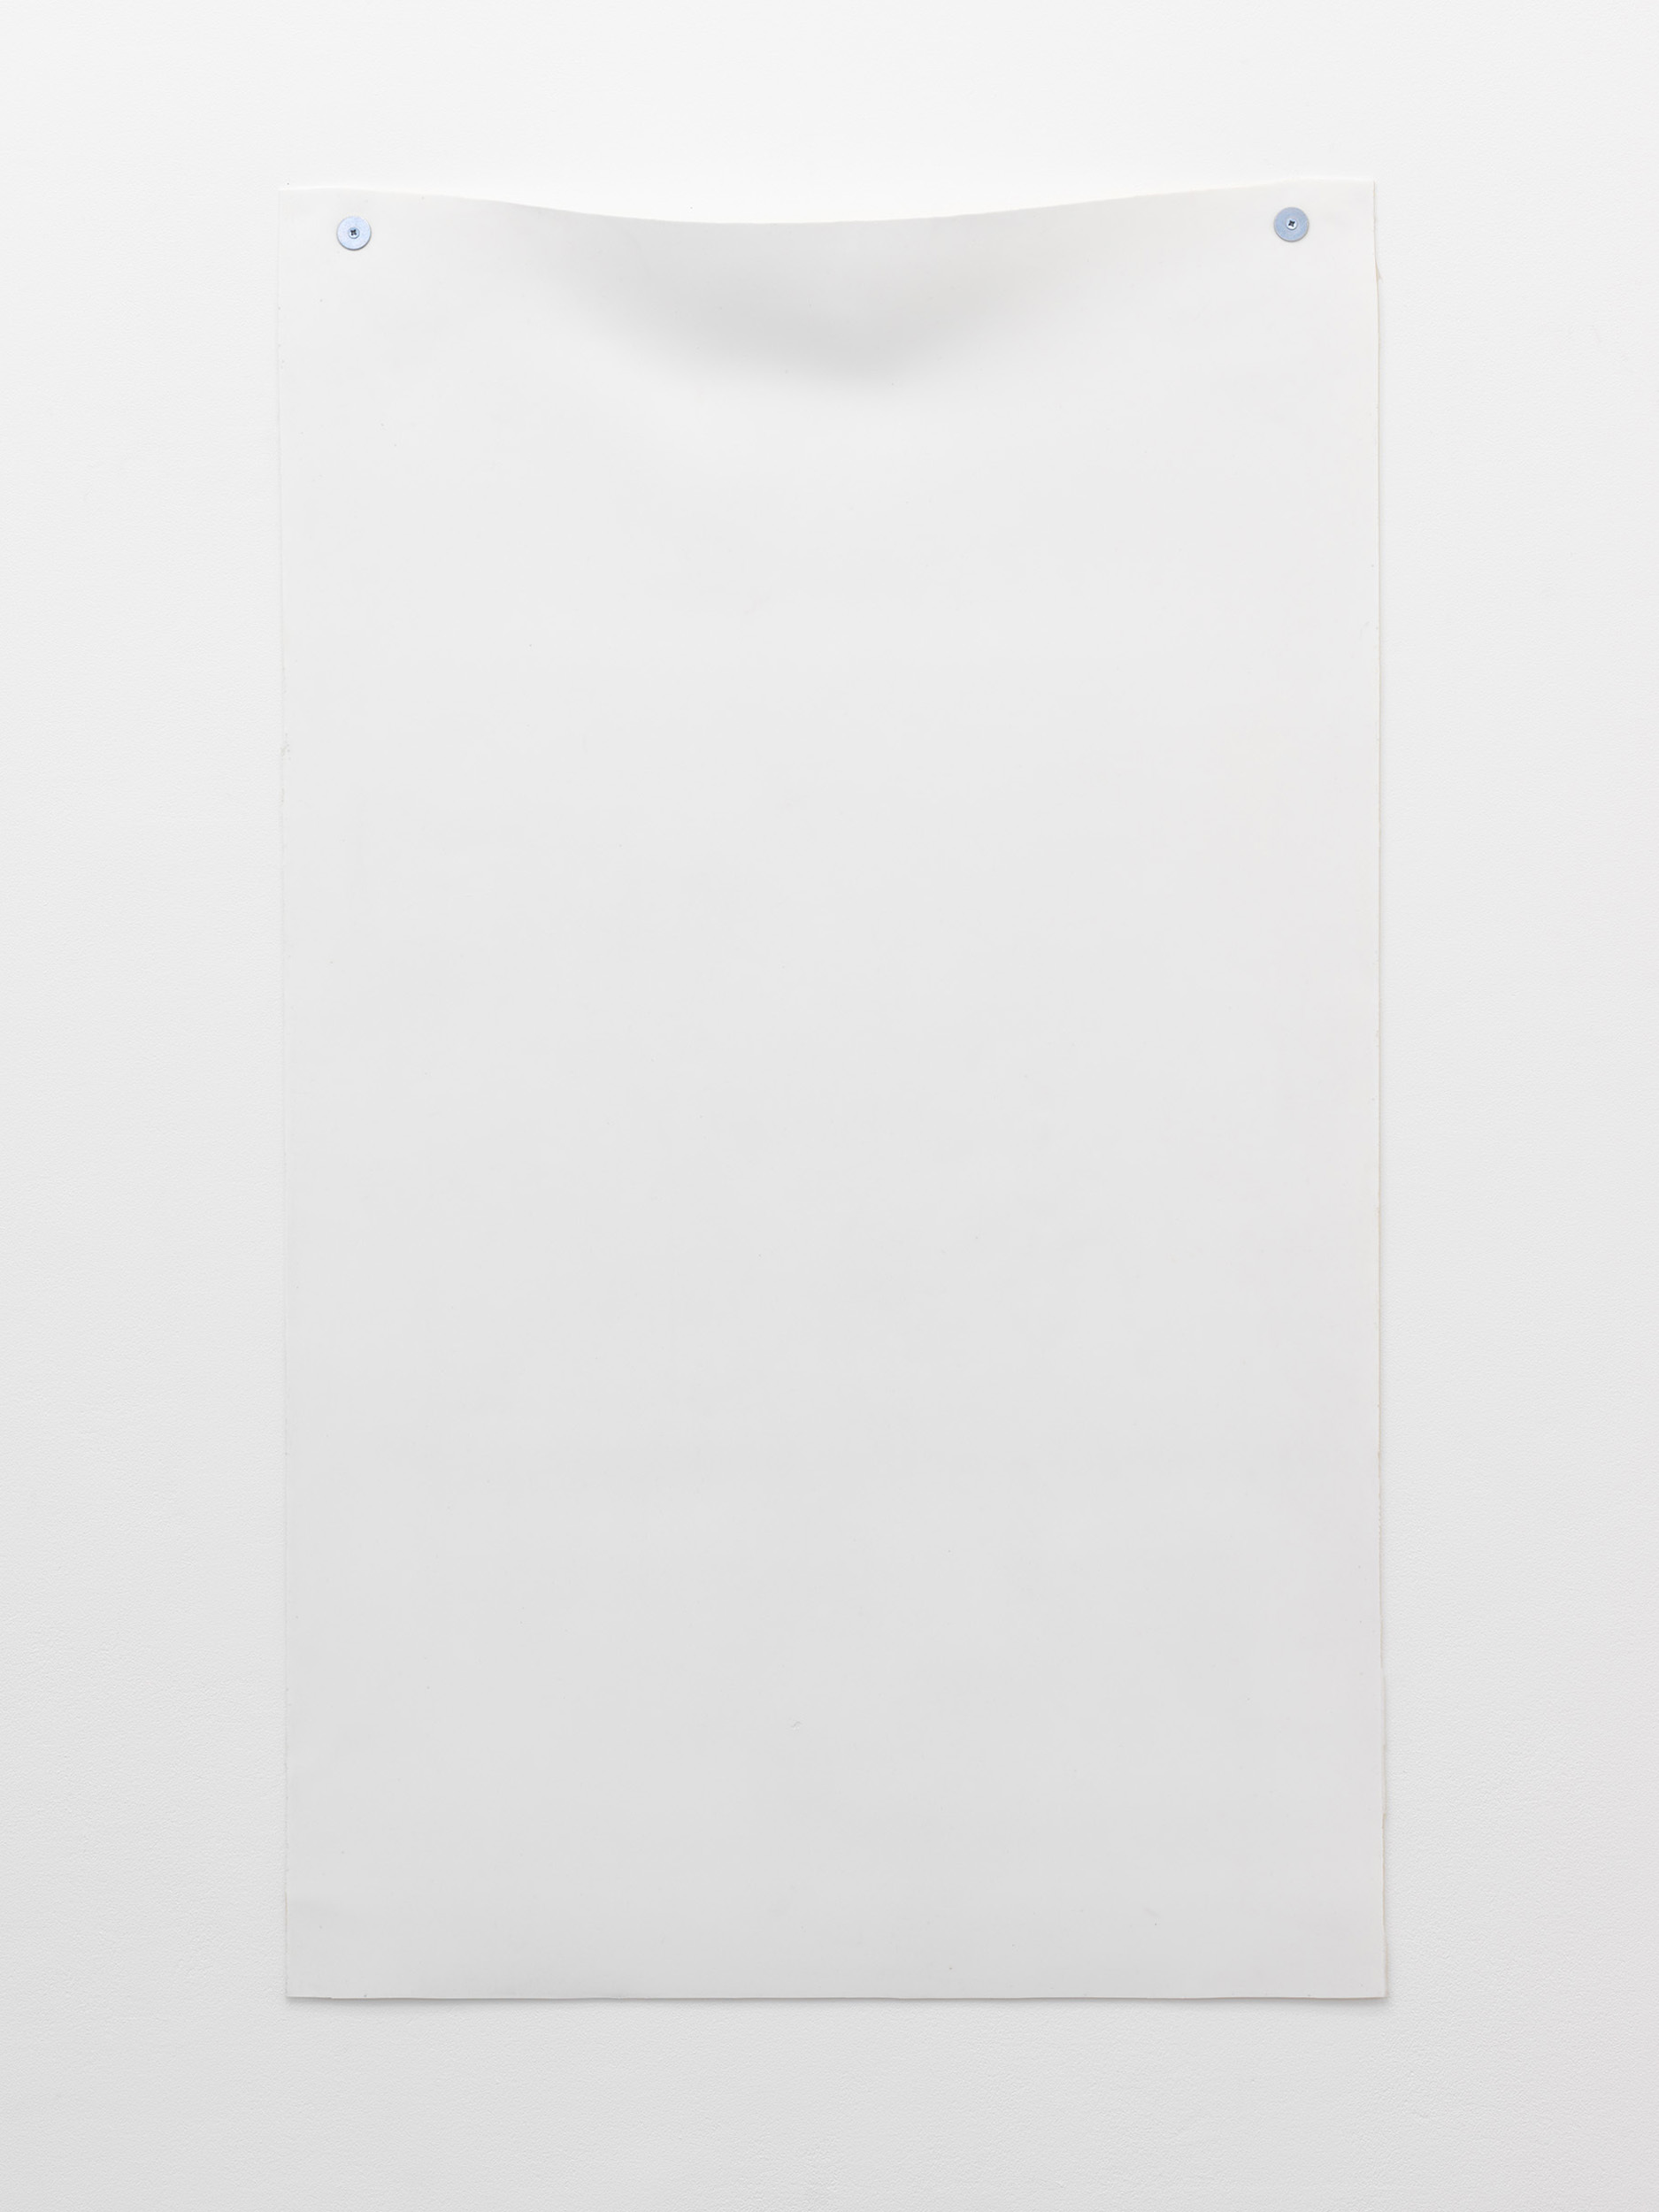 Andrea Zucchini, Untitled, 2014. Cast silicone, white lead, antidepressant, fixings.